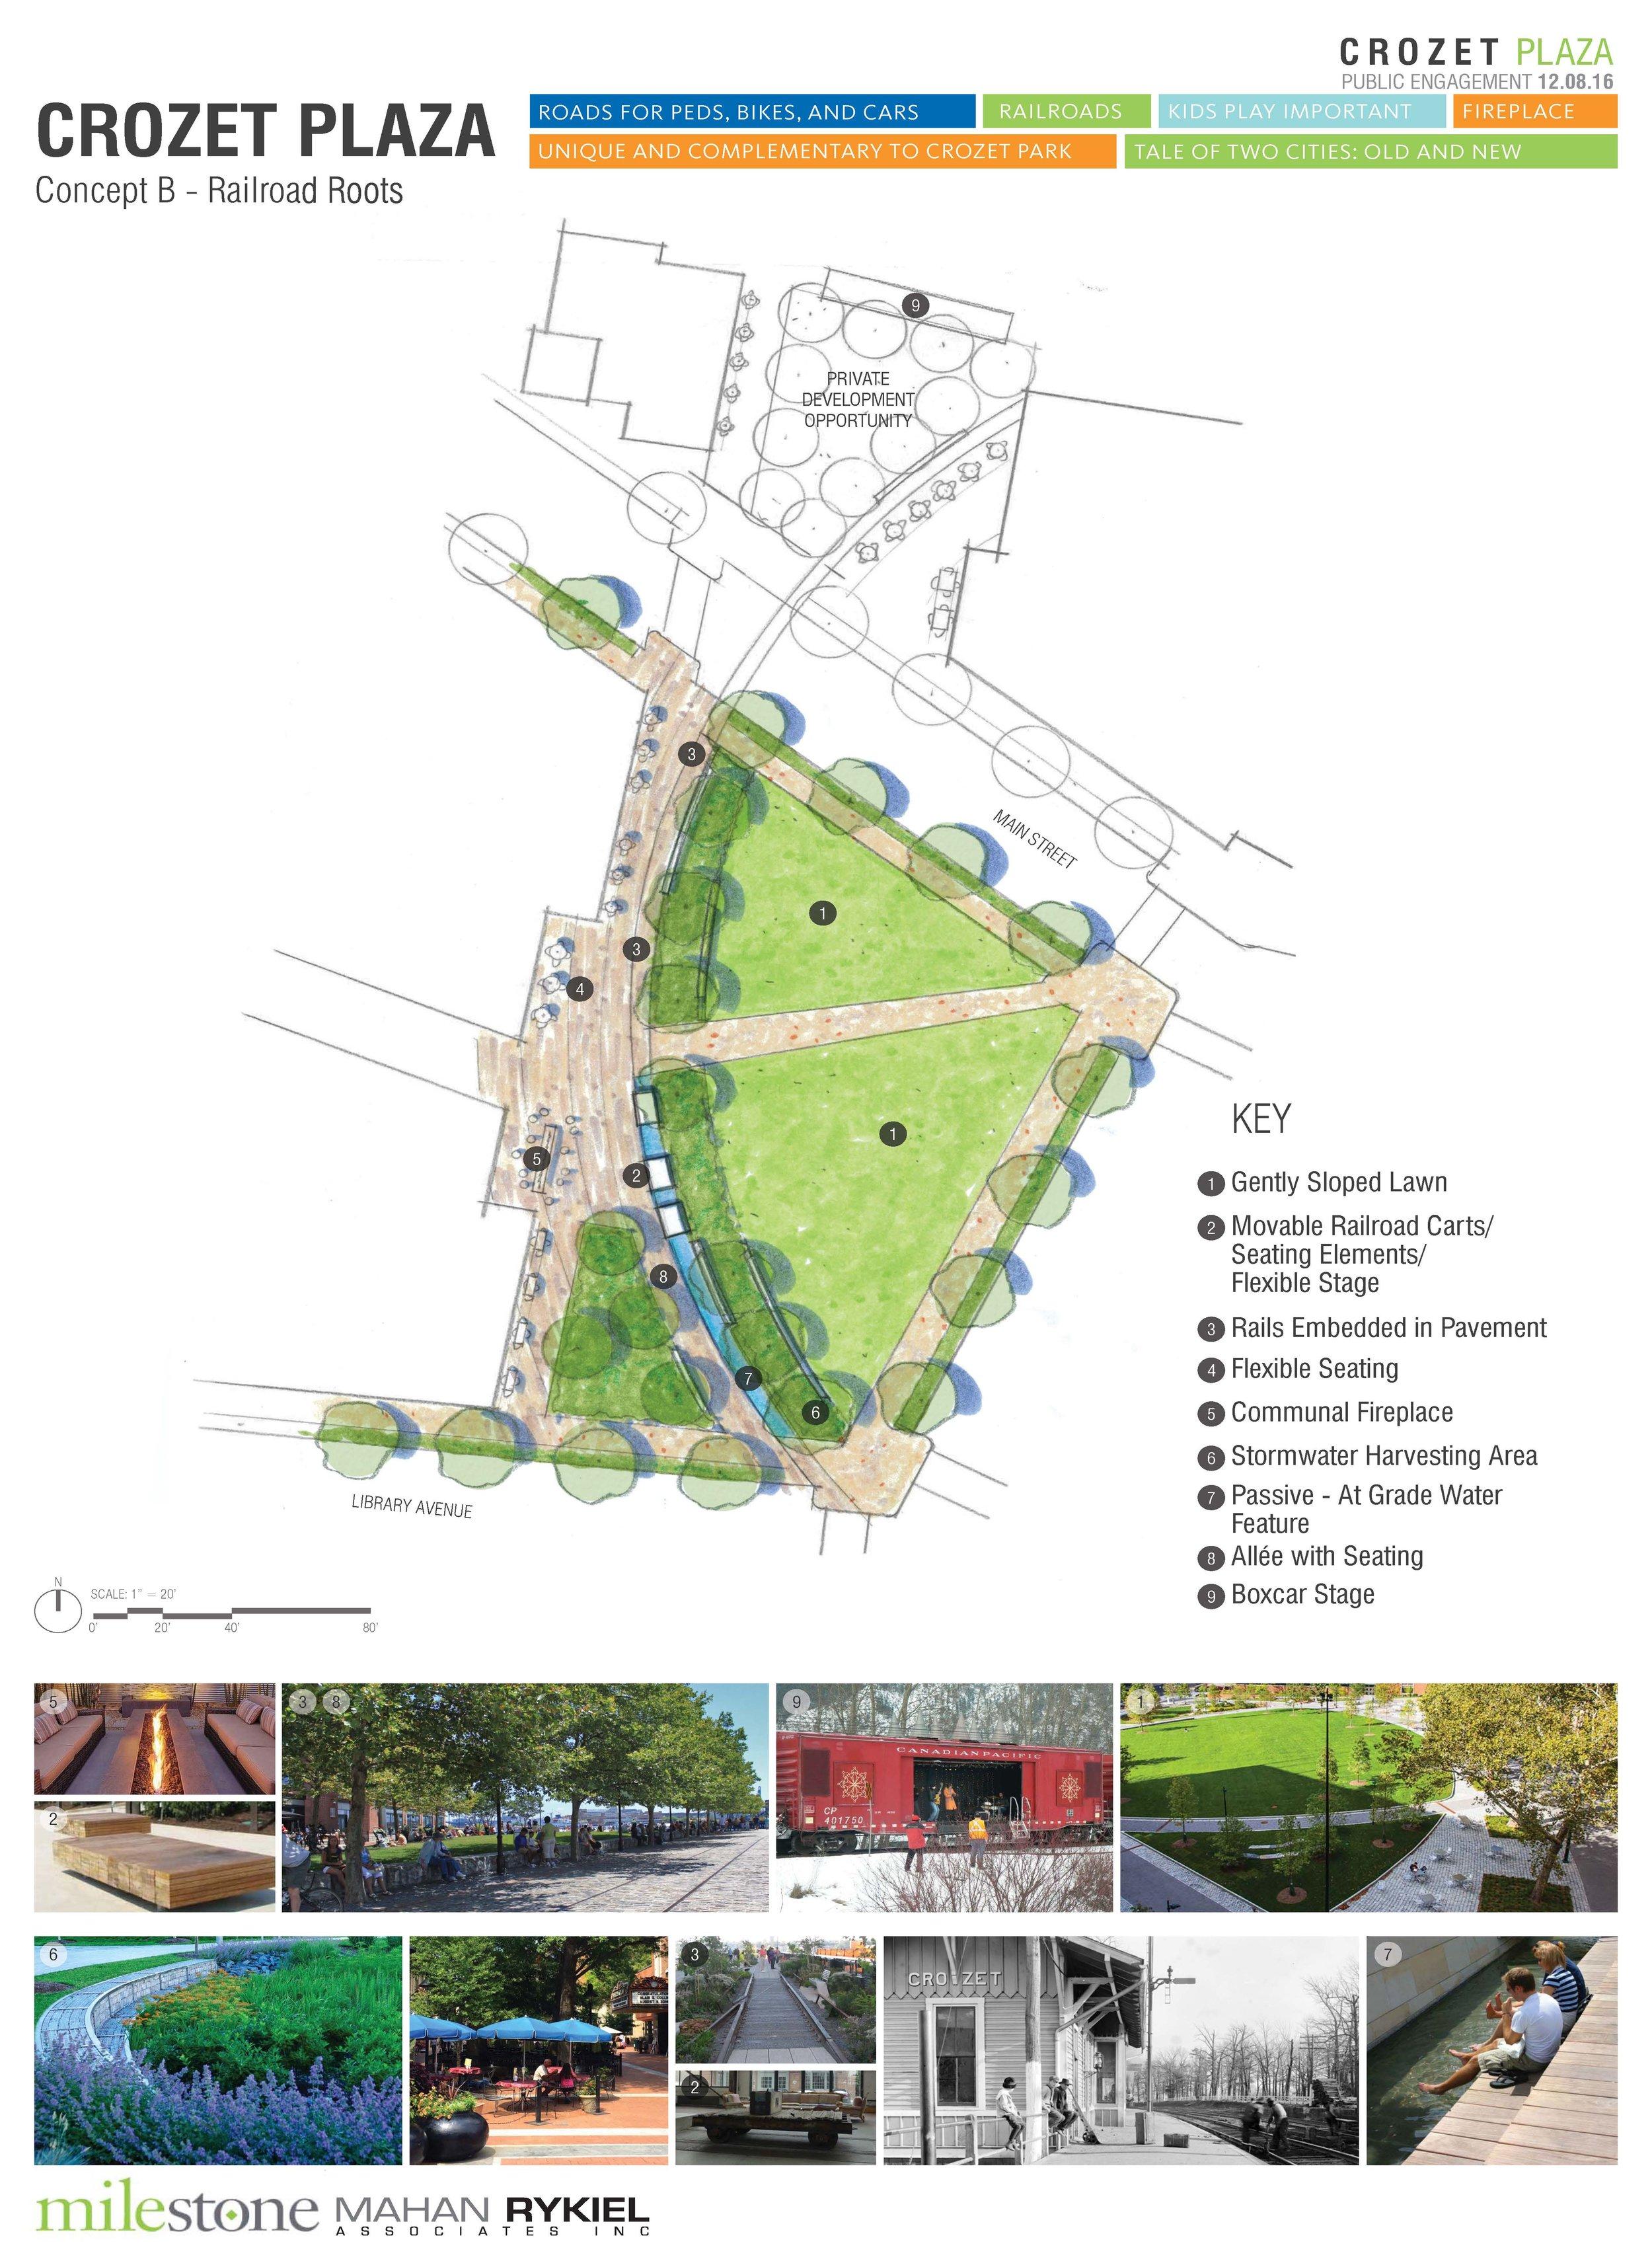 Crozet Plaza Design B